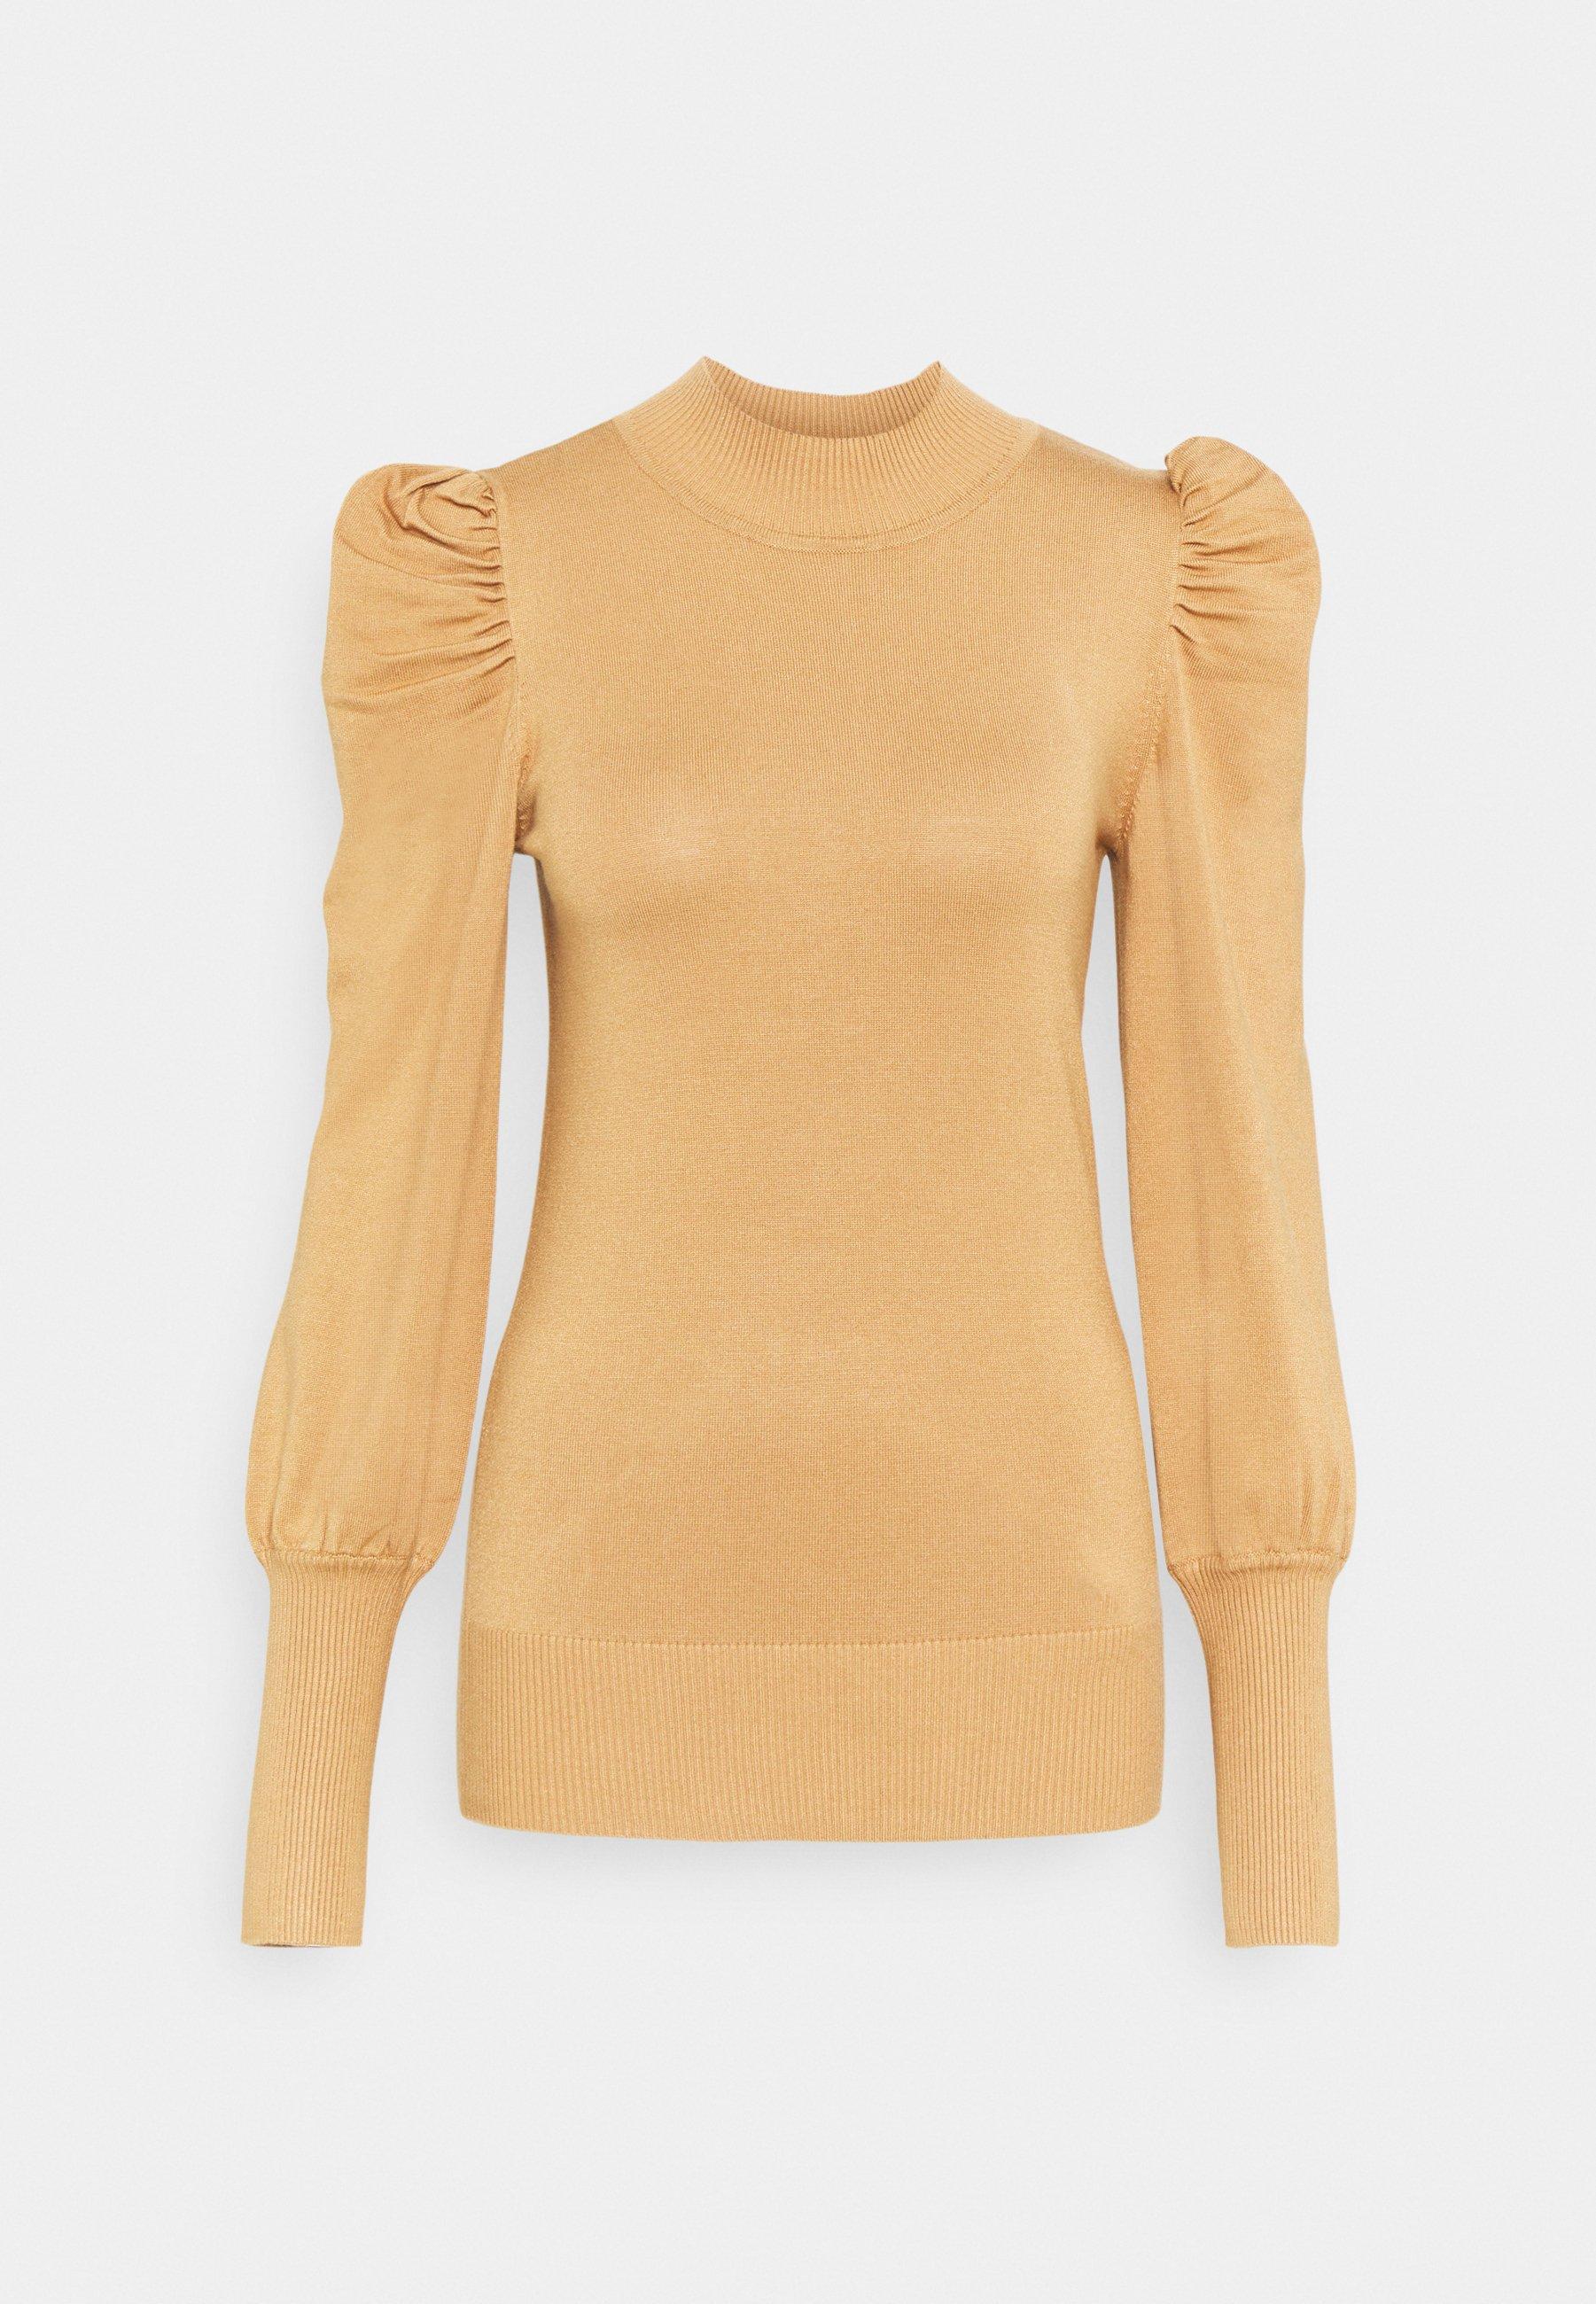 Femme TALL PINK FINE GAUGE VOLUME SLEEVE JUMPER - Pullover